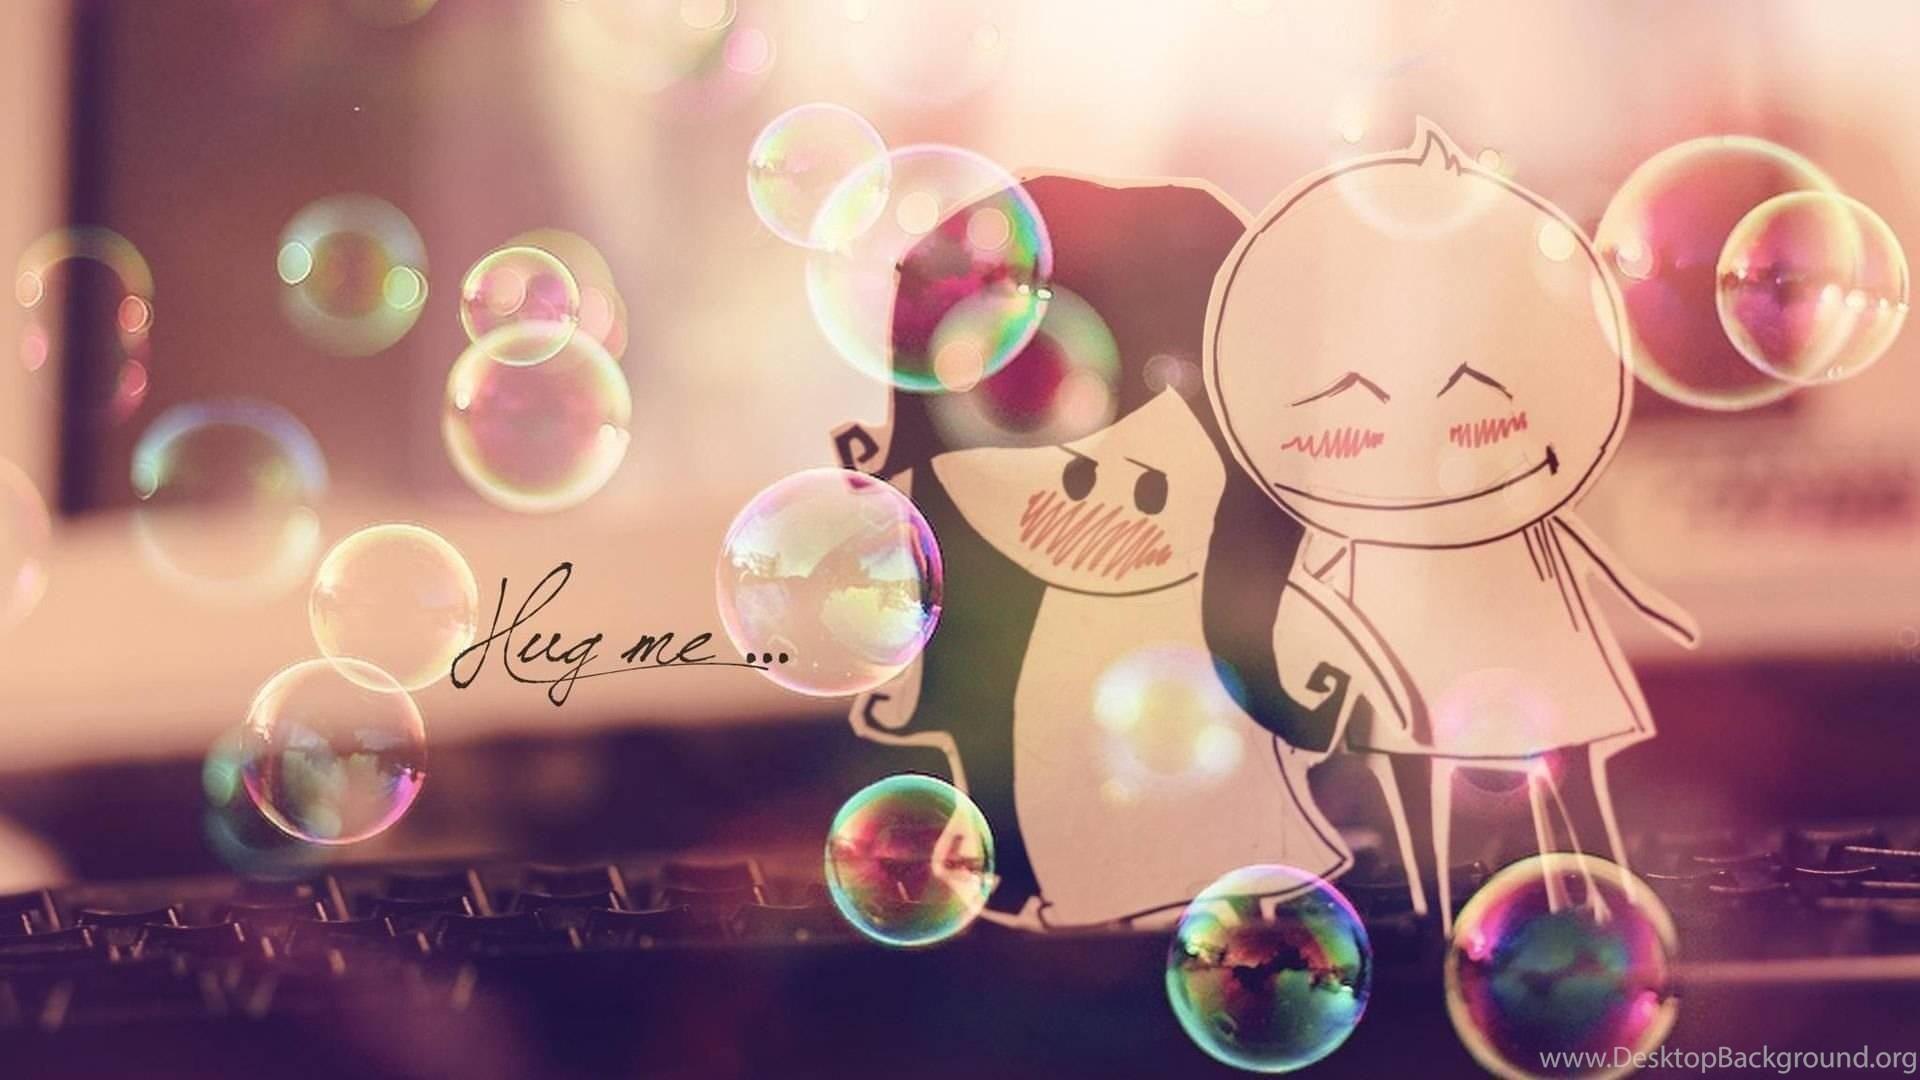 Top 150 Beautiful Cute Romantic Love Couple Hd Wallpapers Desktop Background